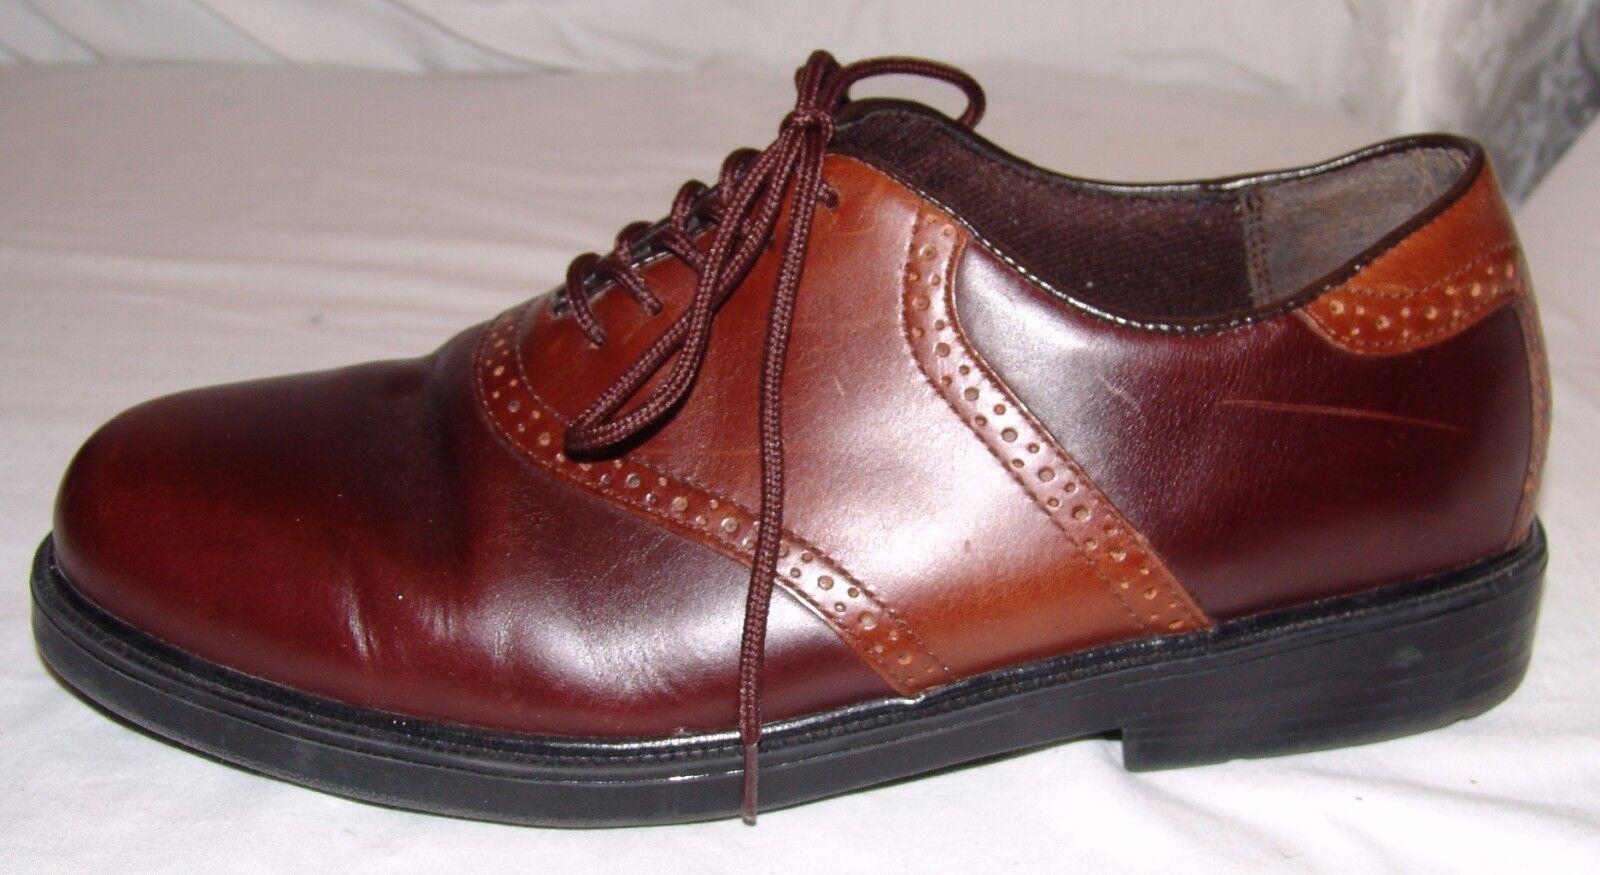 Nunn Bush Brown Saddle M Shoes Mens 11 1/2 M Saddle 11.5 Dress Leather Wing Tip 71f100